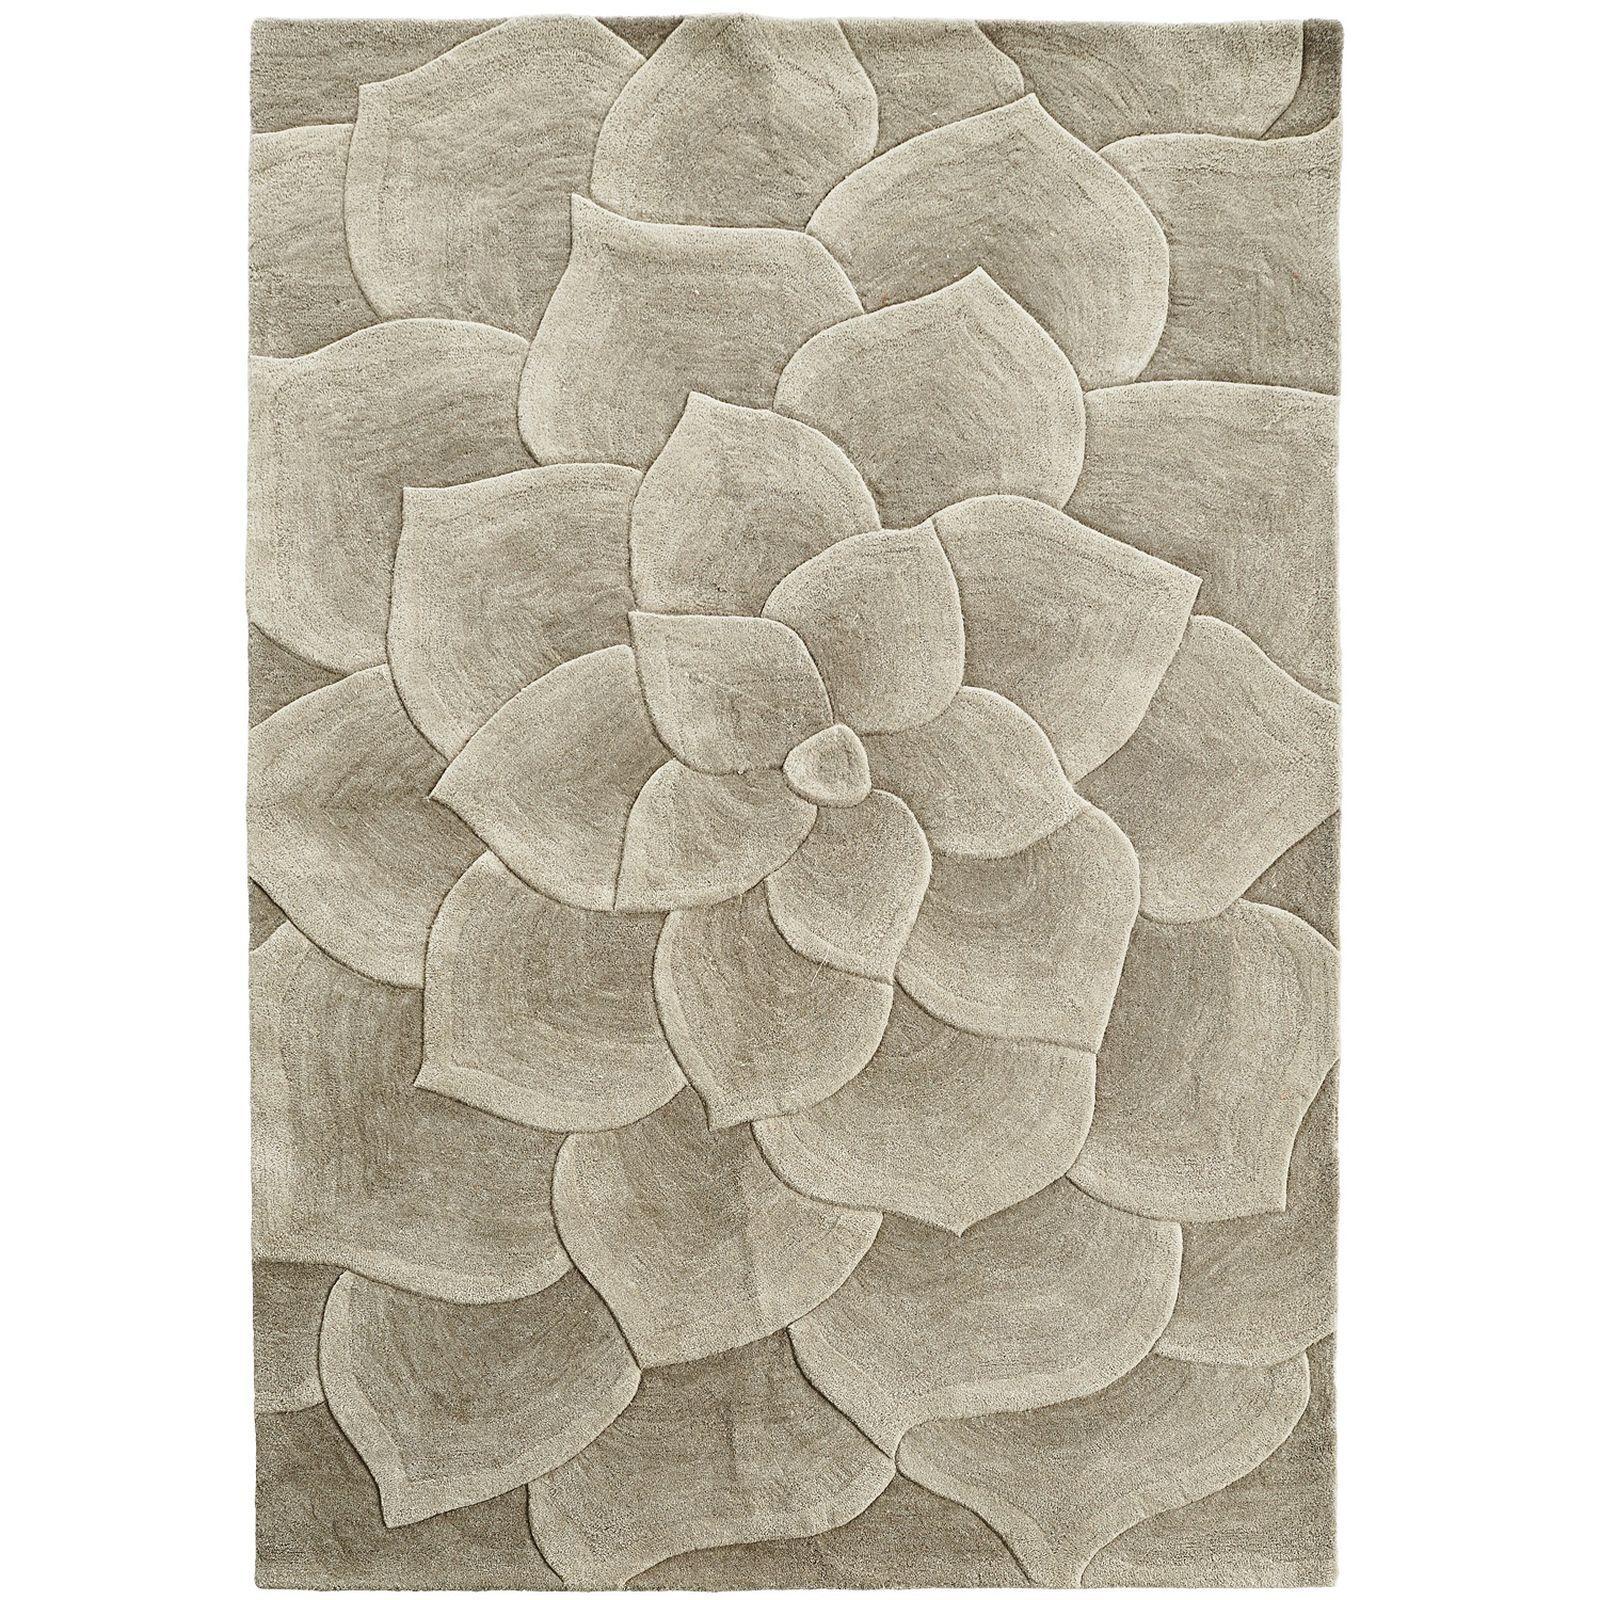 Rose Tufted Ivory 6x9 Rug